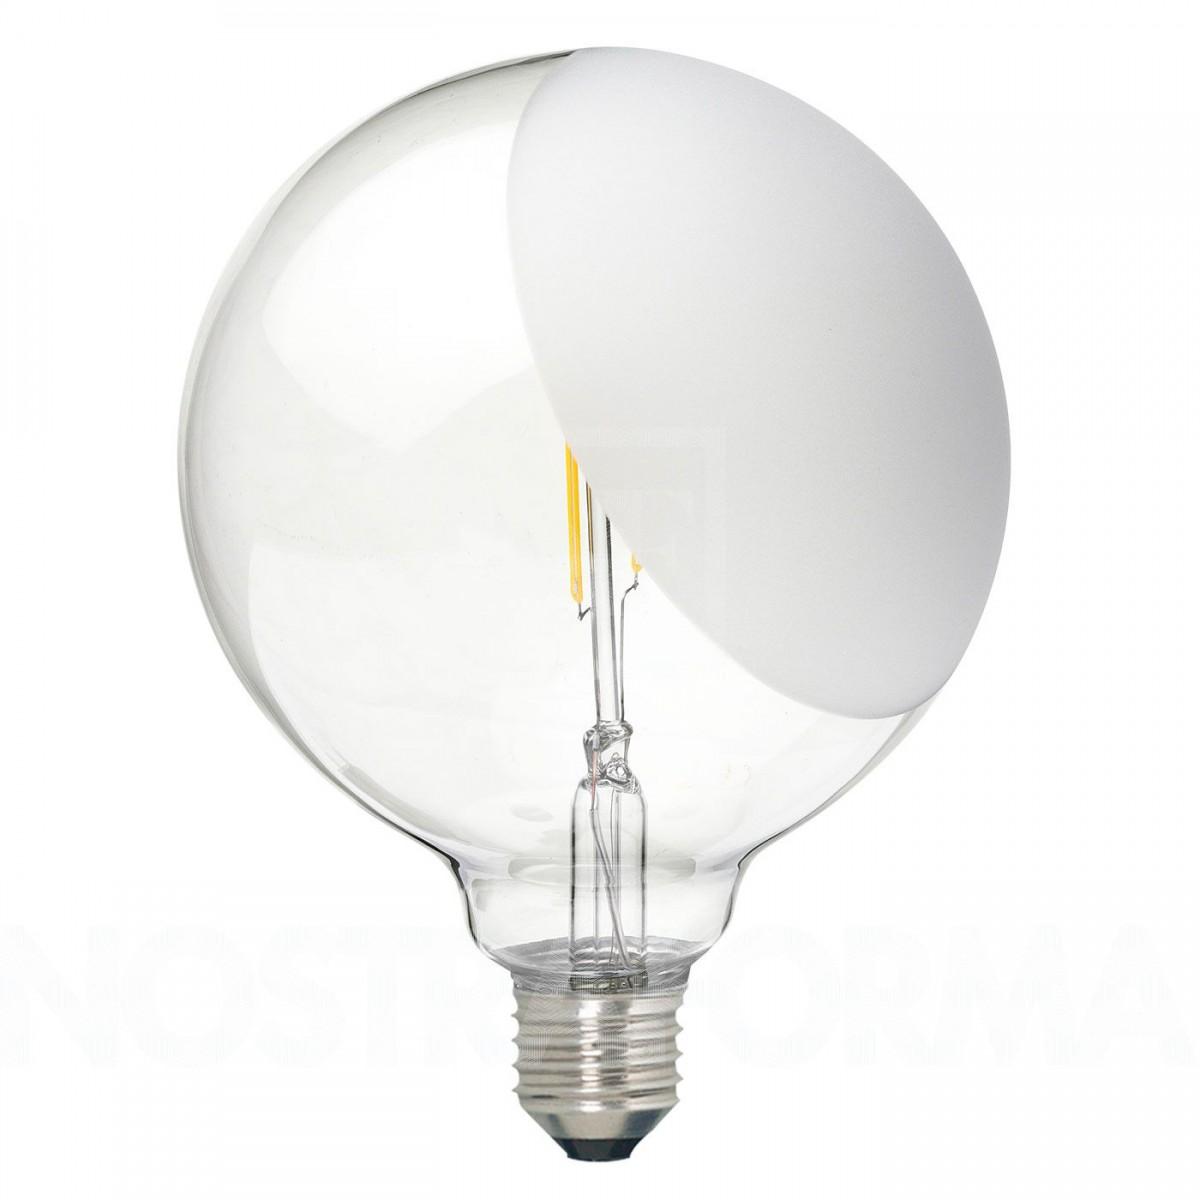 Lampada di ricambio per lampadina di flos pianeta luce for Vendita lampadine